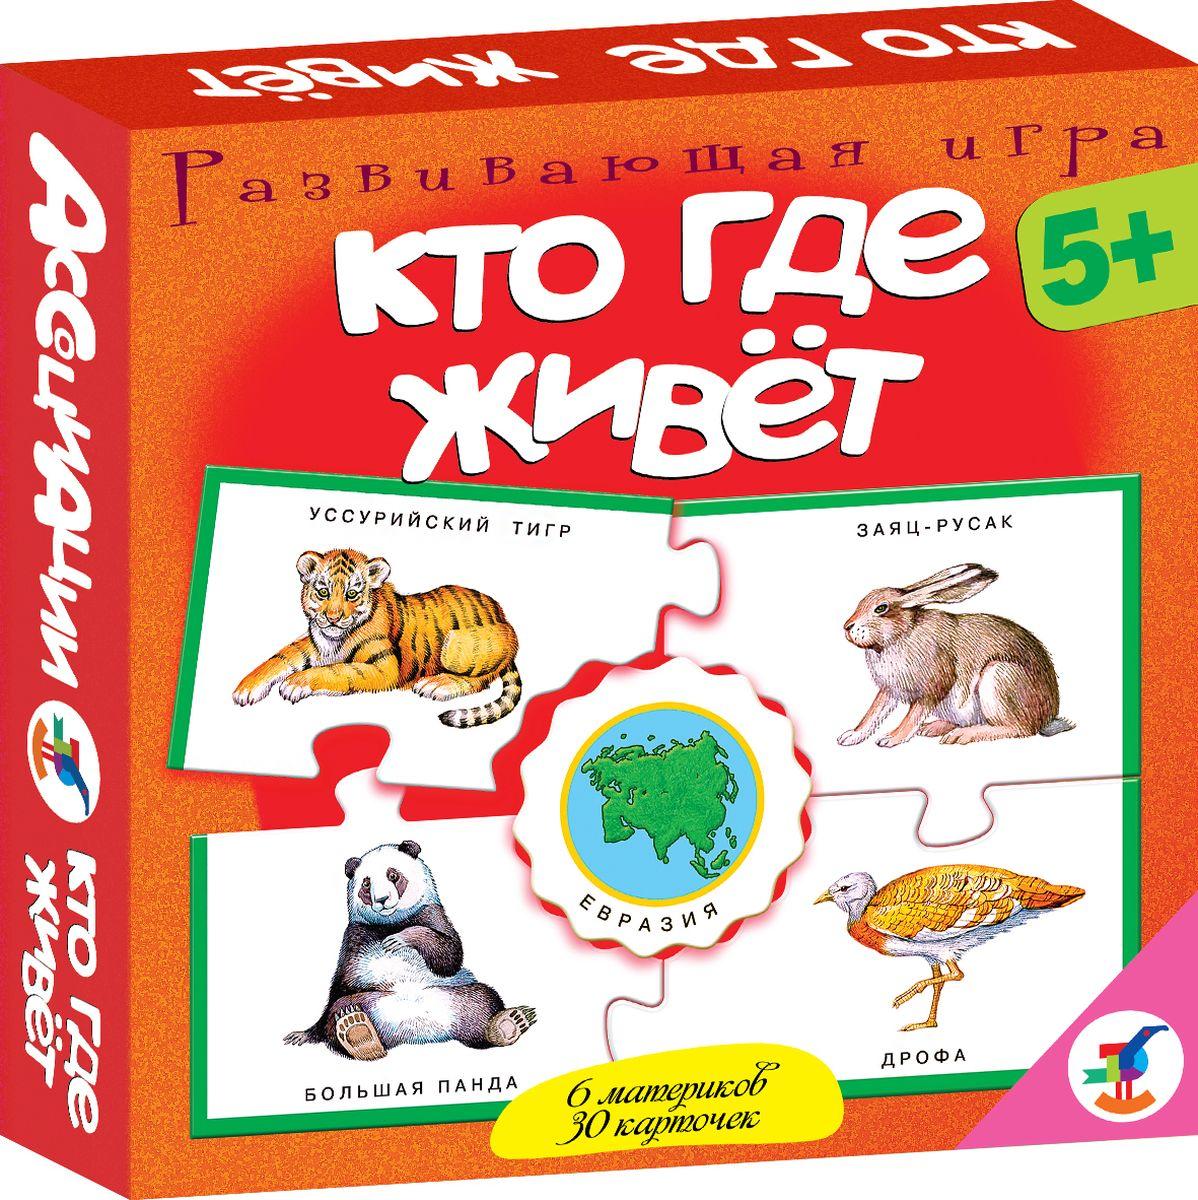 Дрофа-Медиа Обучающая игра Кто где живет дрофа медиа магнит в коробке карточки с животными на магнитах